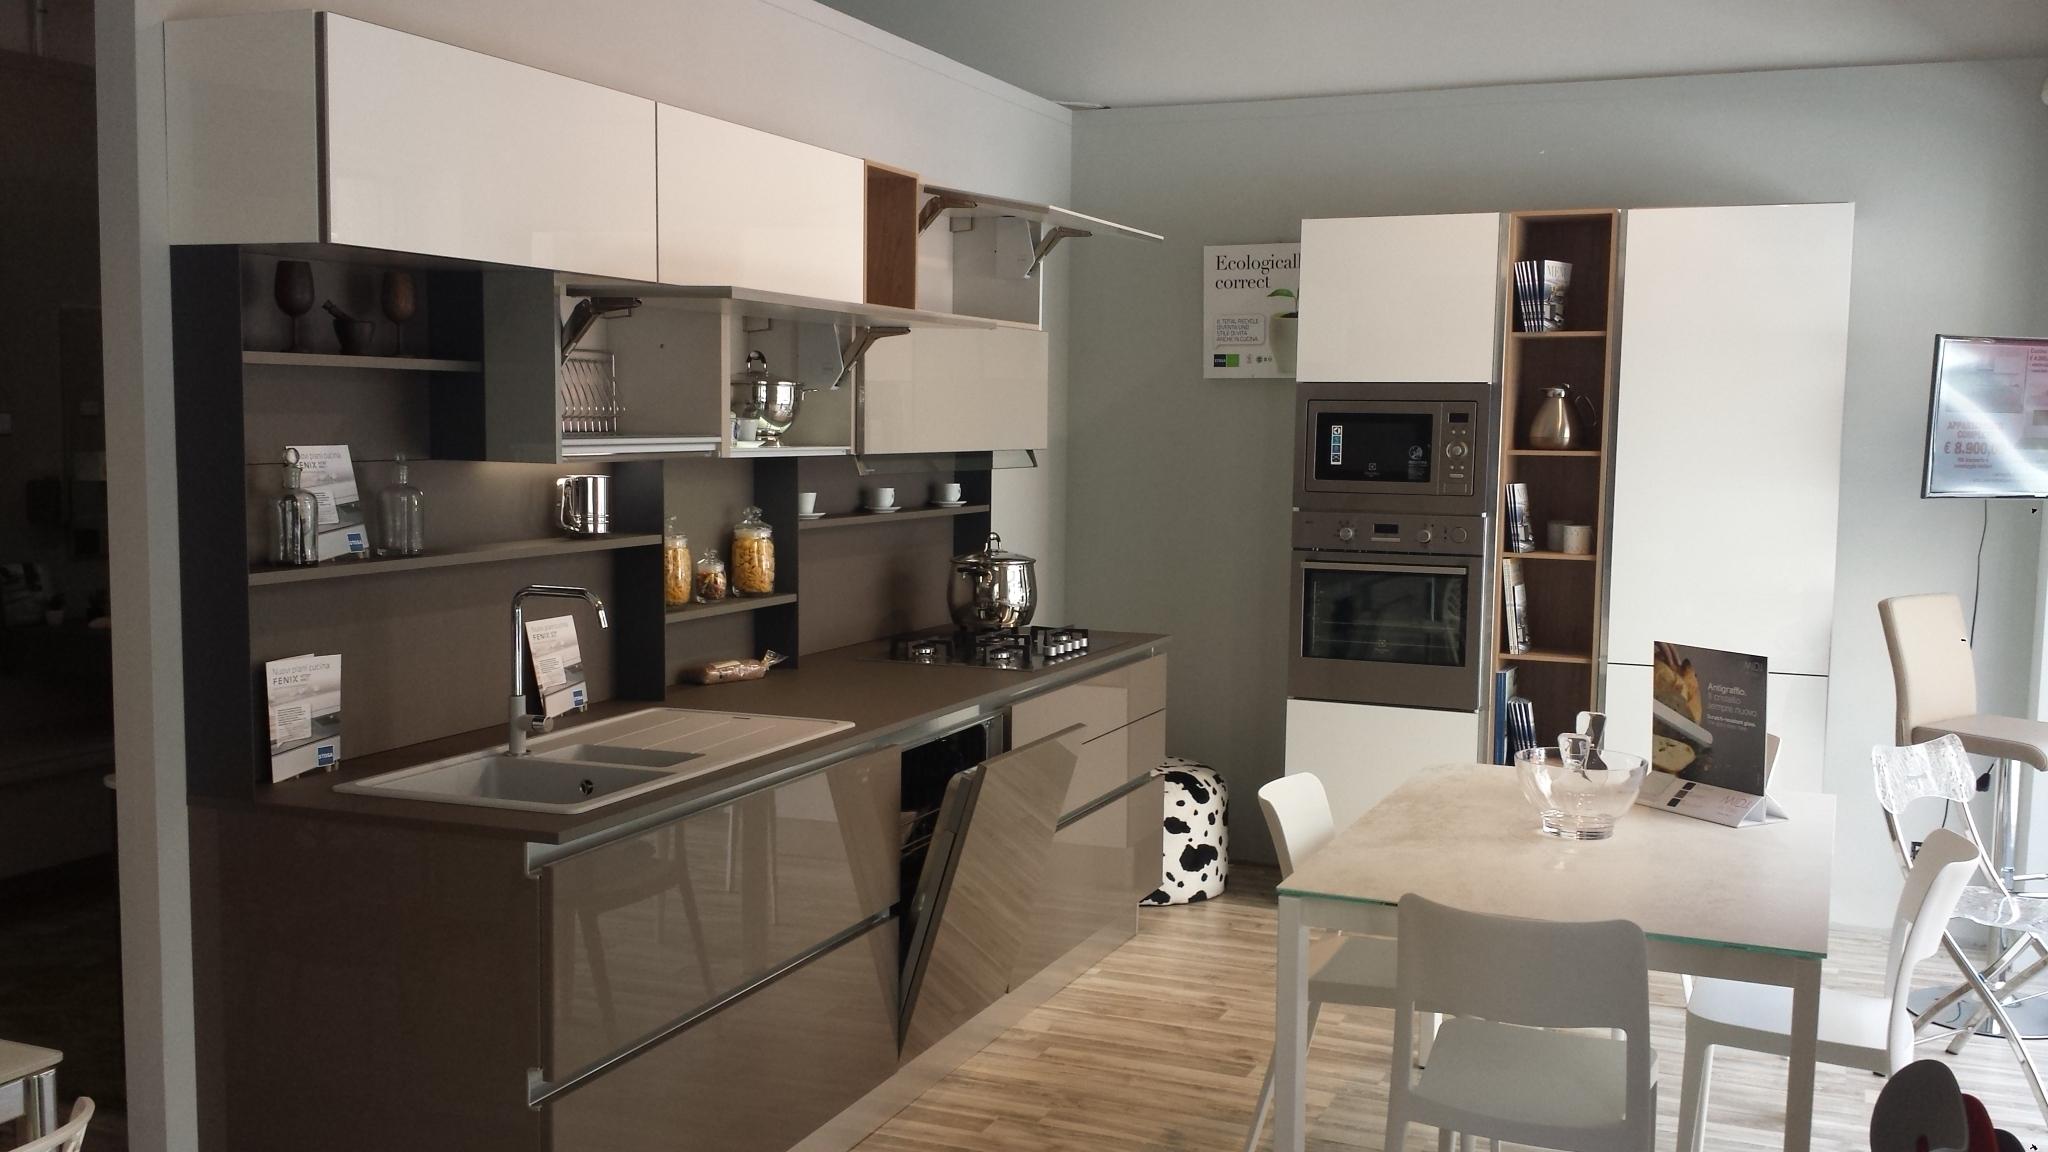 Cucina stosa cucine alev offerta esposizione cucine a for Stosa cucine prezzi